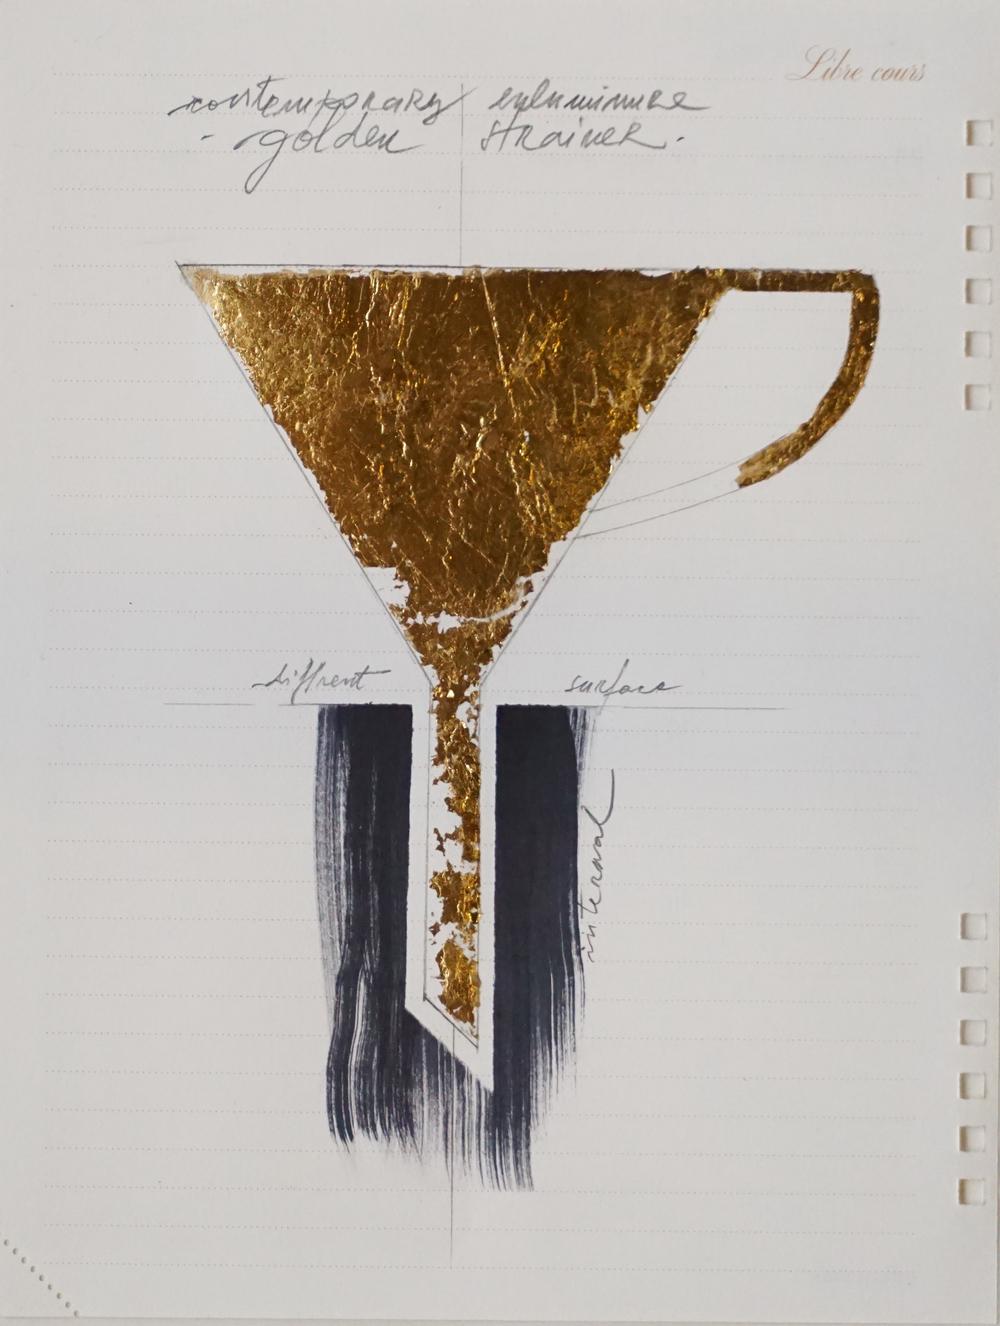 Temporel Louis Vuitton 2 (2015) mixed media on paper 22 x 16 cm